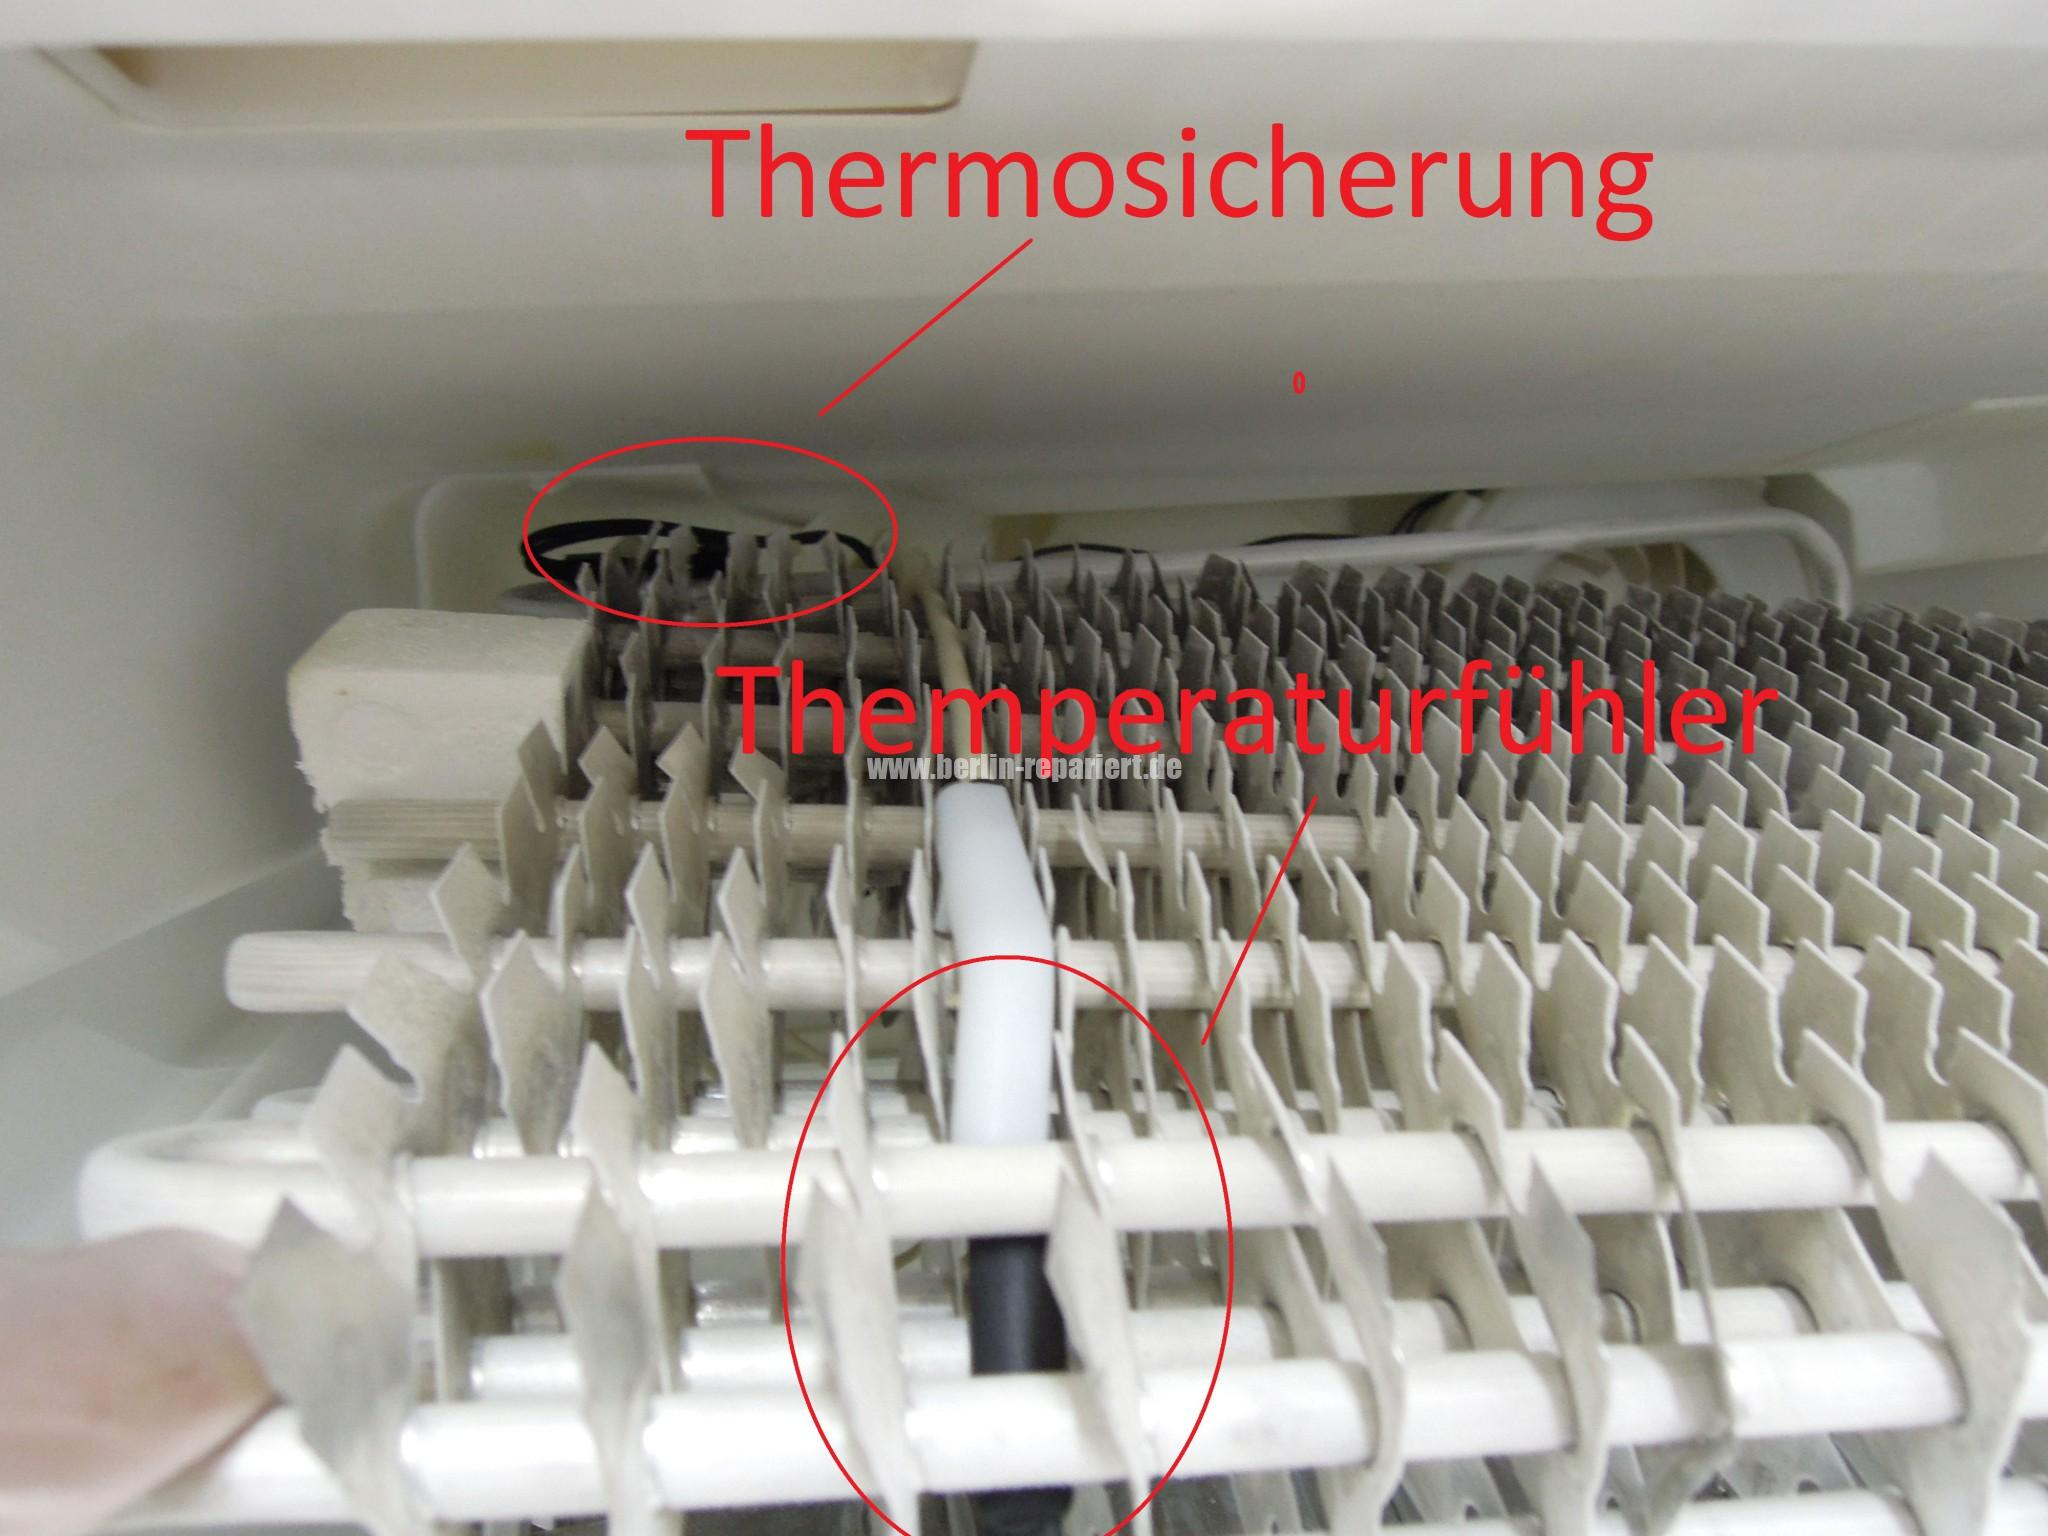 Bosch Kühlschrank Kühlt Nicht Mehr : Bosch kühlschrank gefrierfach kühlt nicht: siemens kühl gefrierkombi